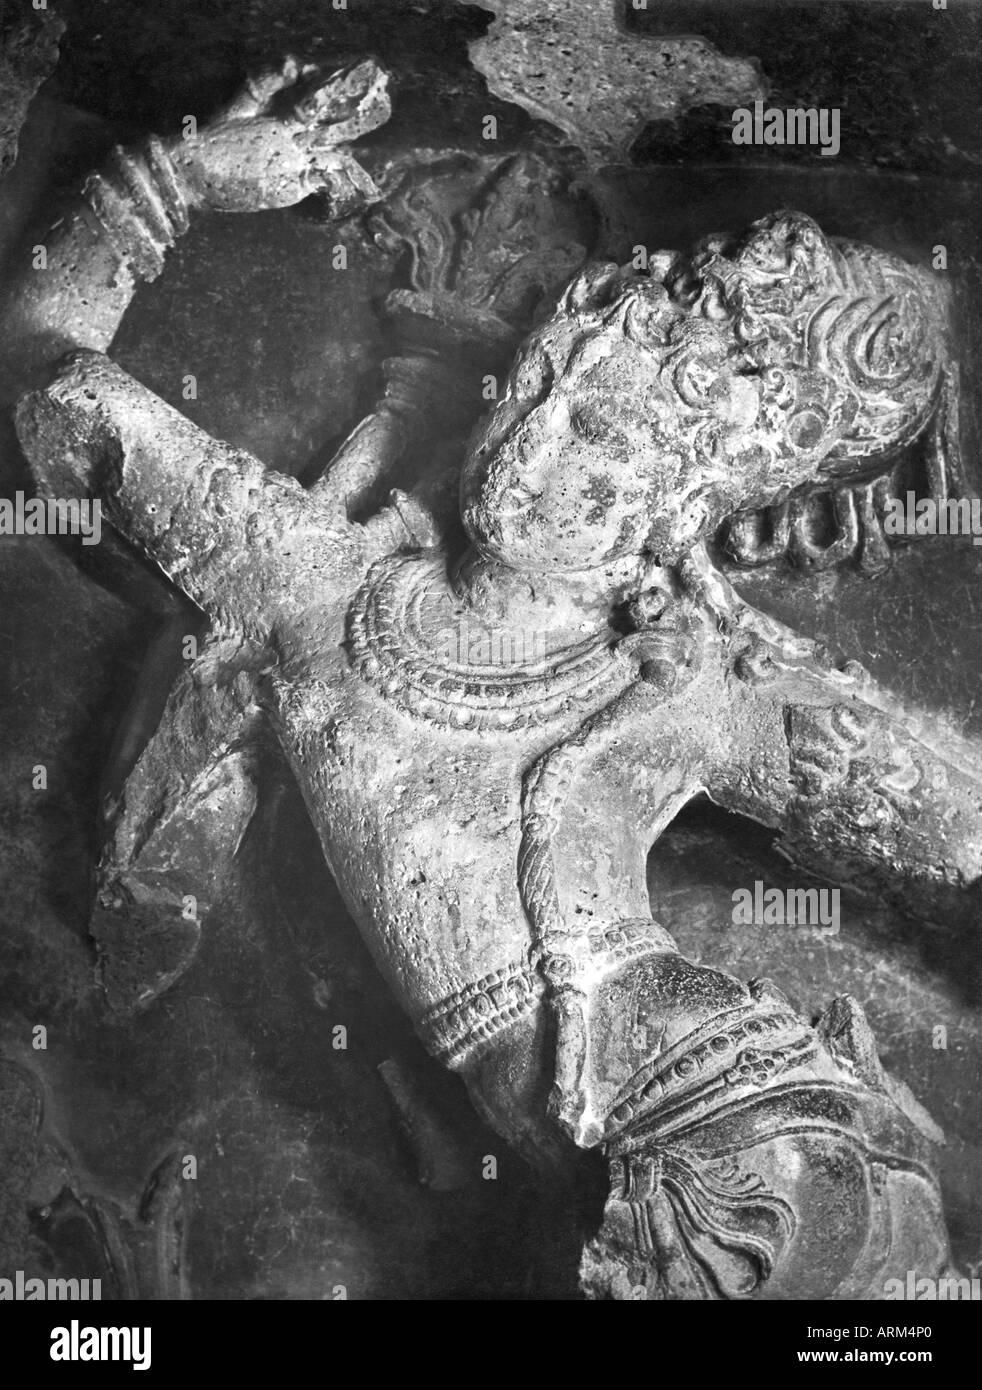 VRB101374 Lalit dance of Shiva sculpture at Ellora caves Aurangabad Maharashtra India 1940s - Stock Image